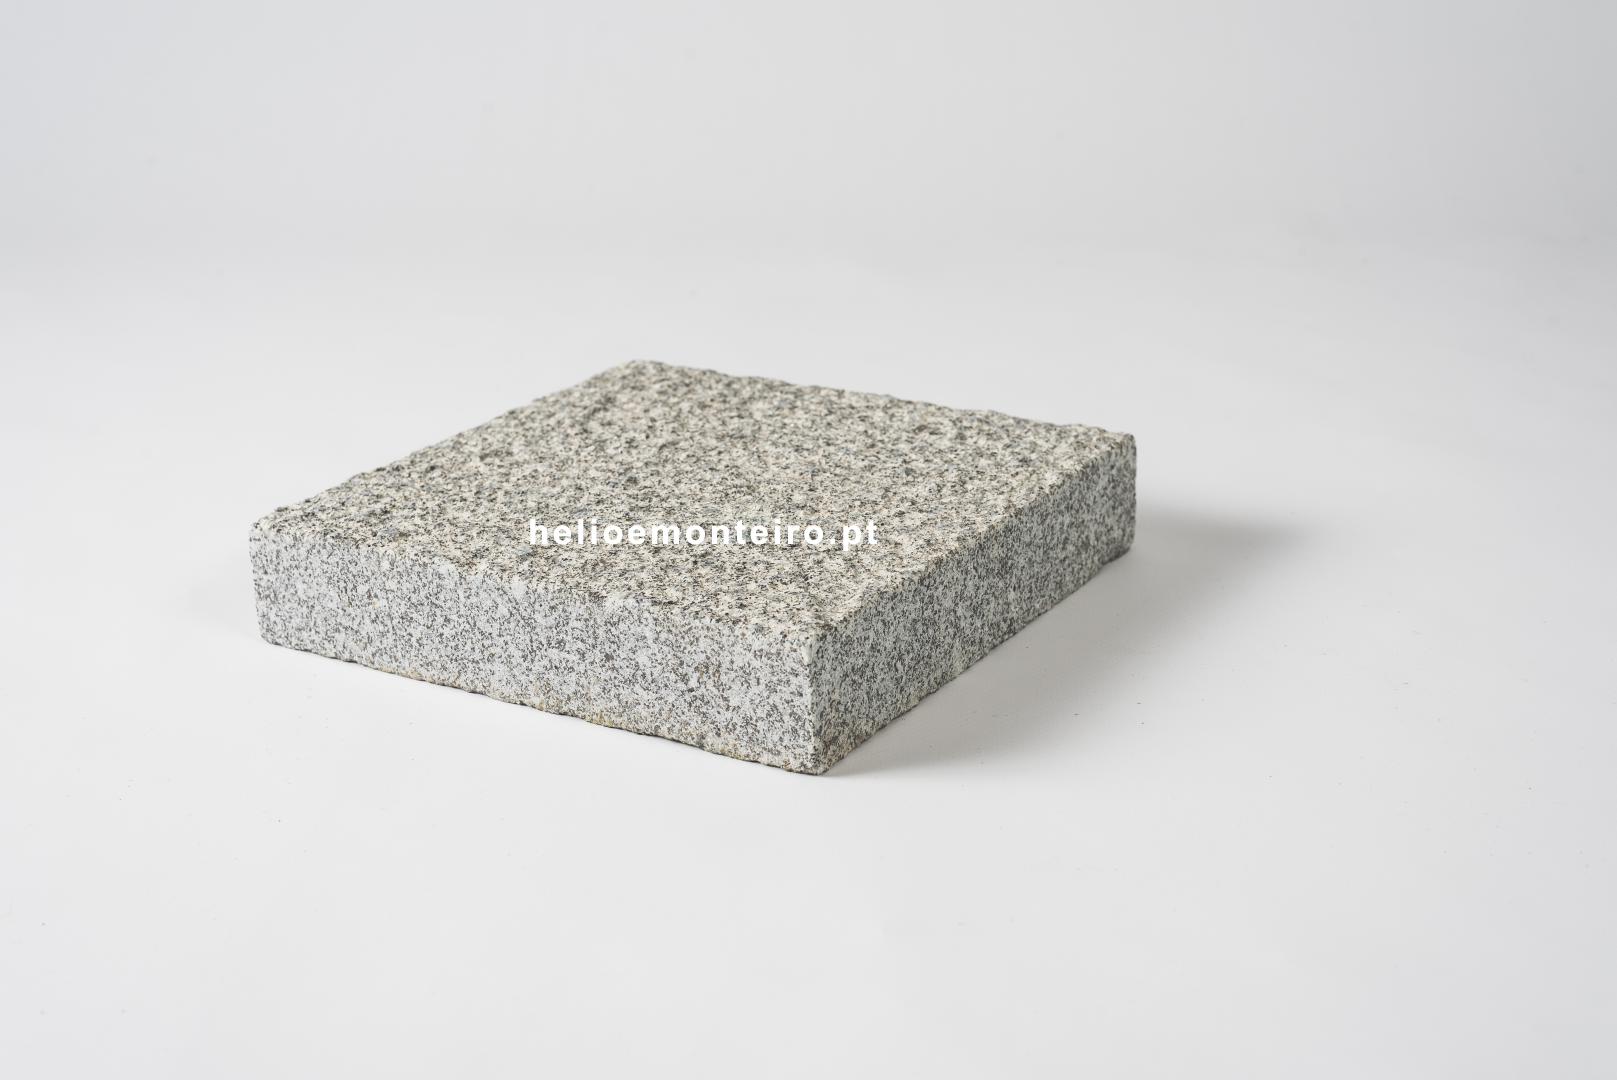 granite slabs hélio monteiro Portugal